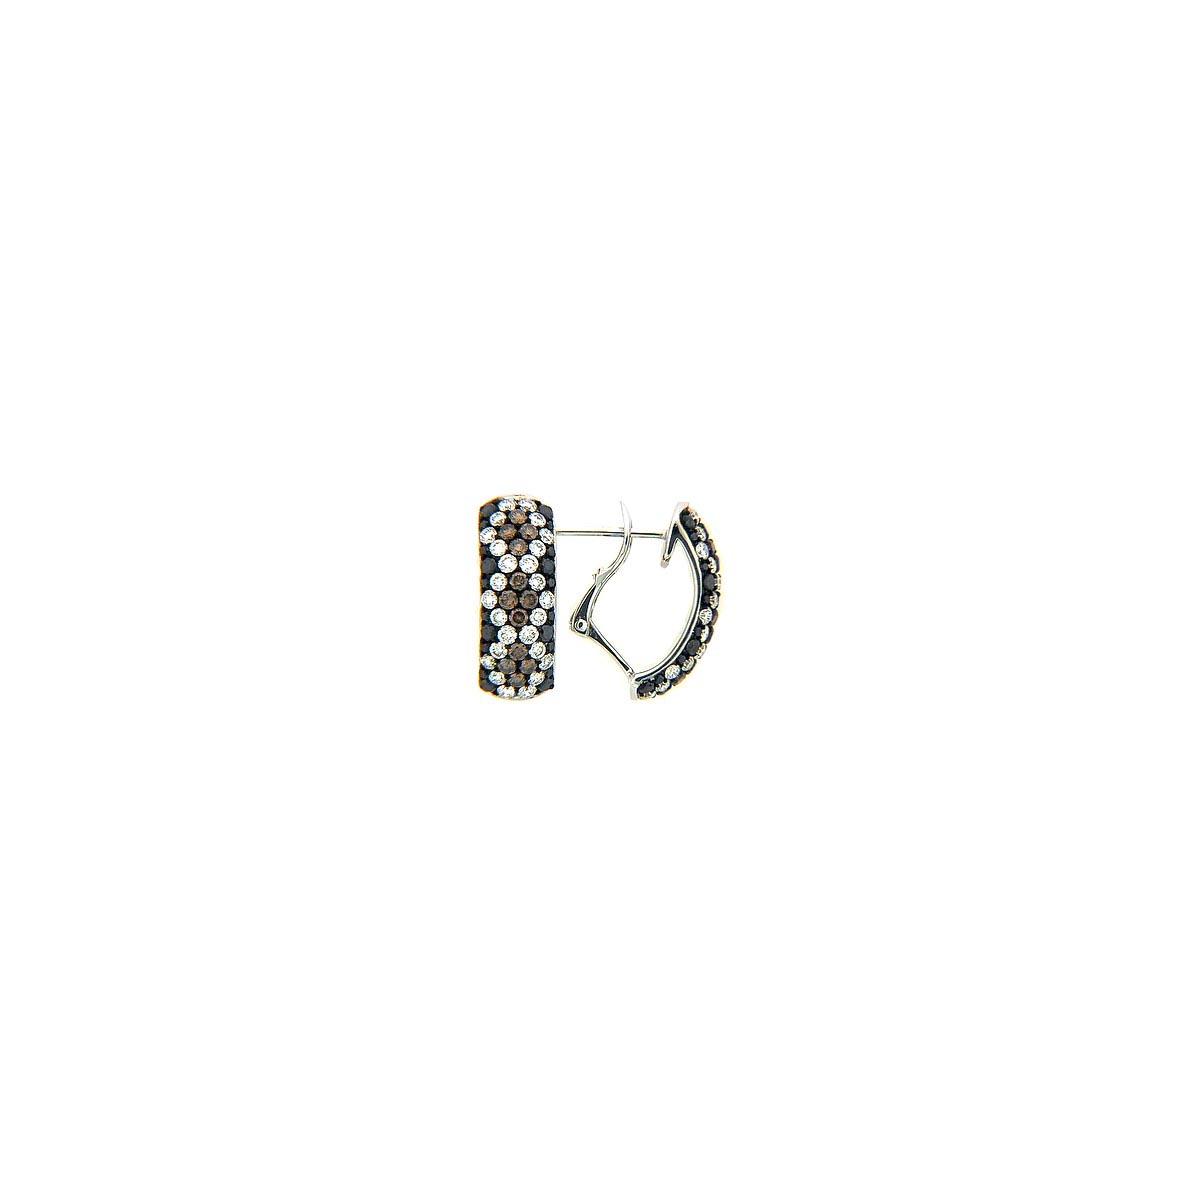 Black, Brown & White Diamond Earring